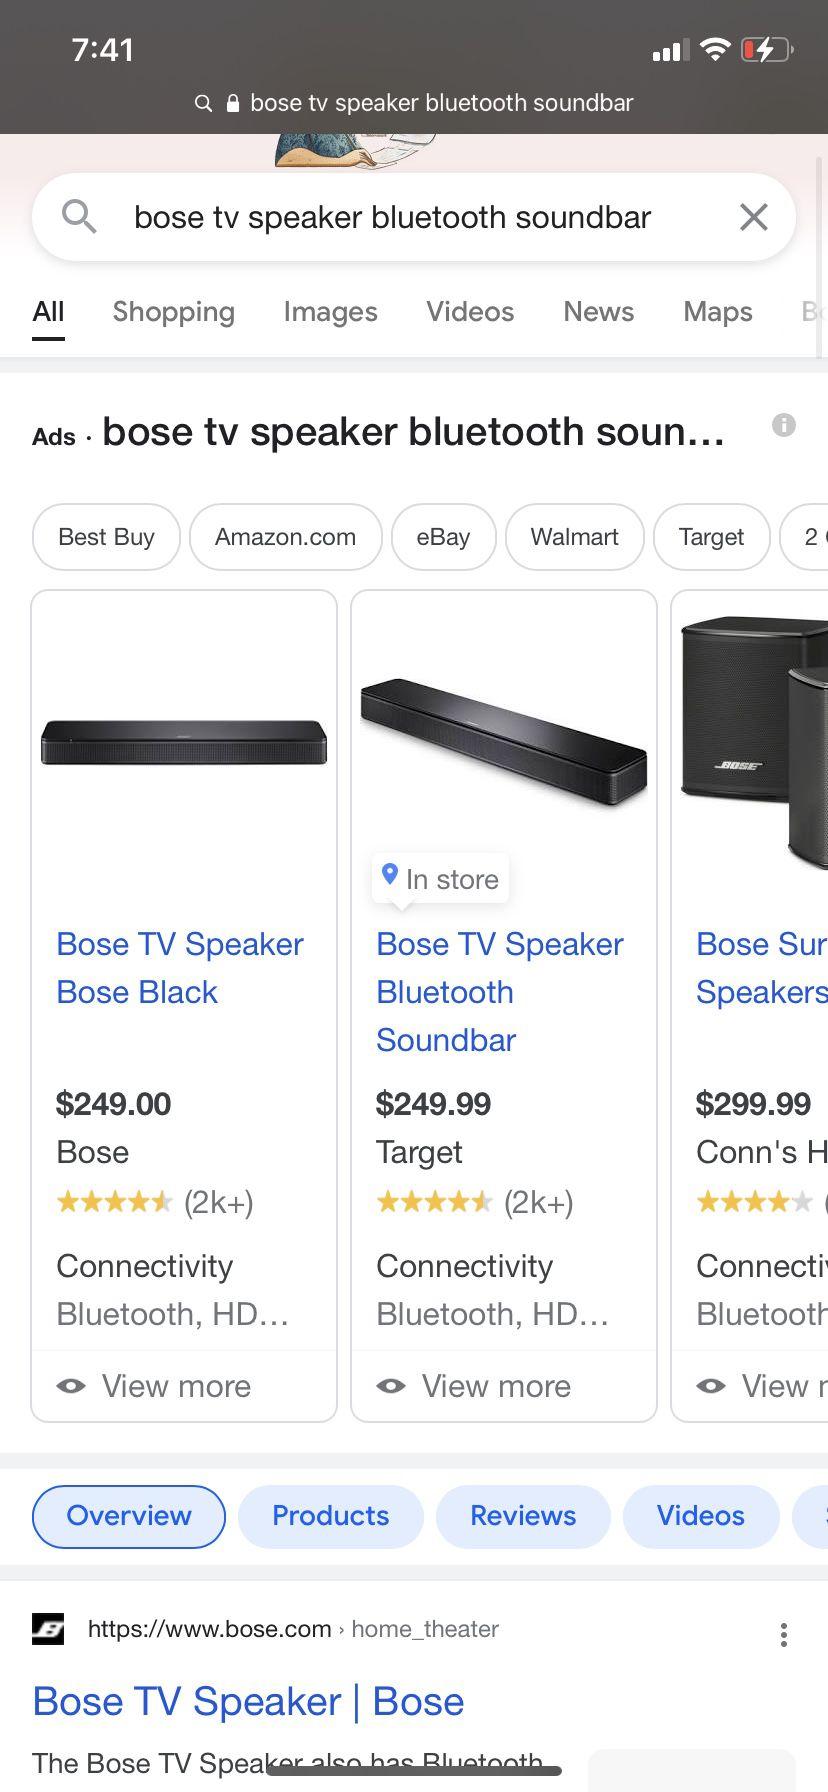 Bose Tv Speaker Bluetooth Soundbar